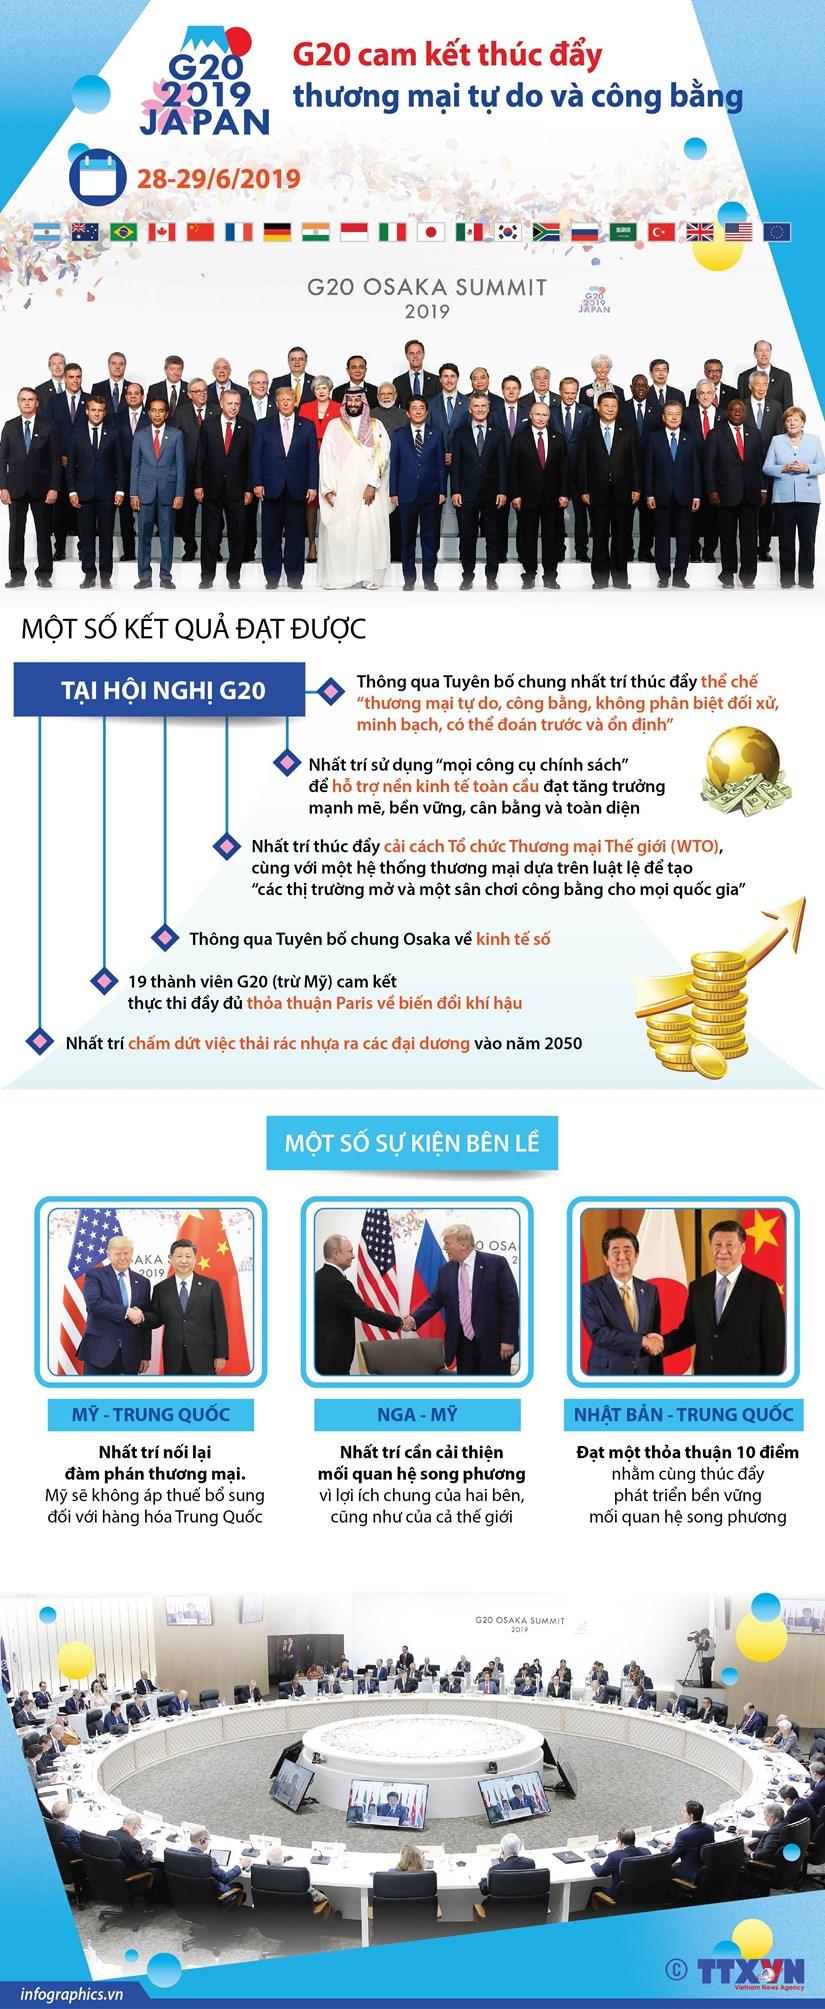 [Infographics] G20 cam ket thuc day thuong mai tu do va cong bang hinh anh 1